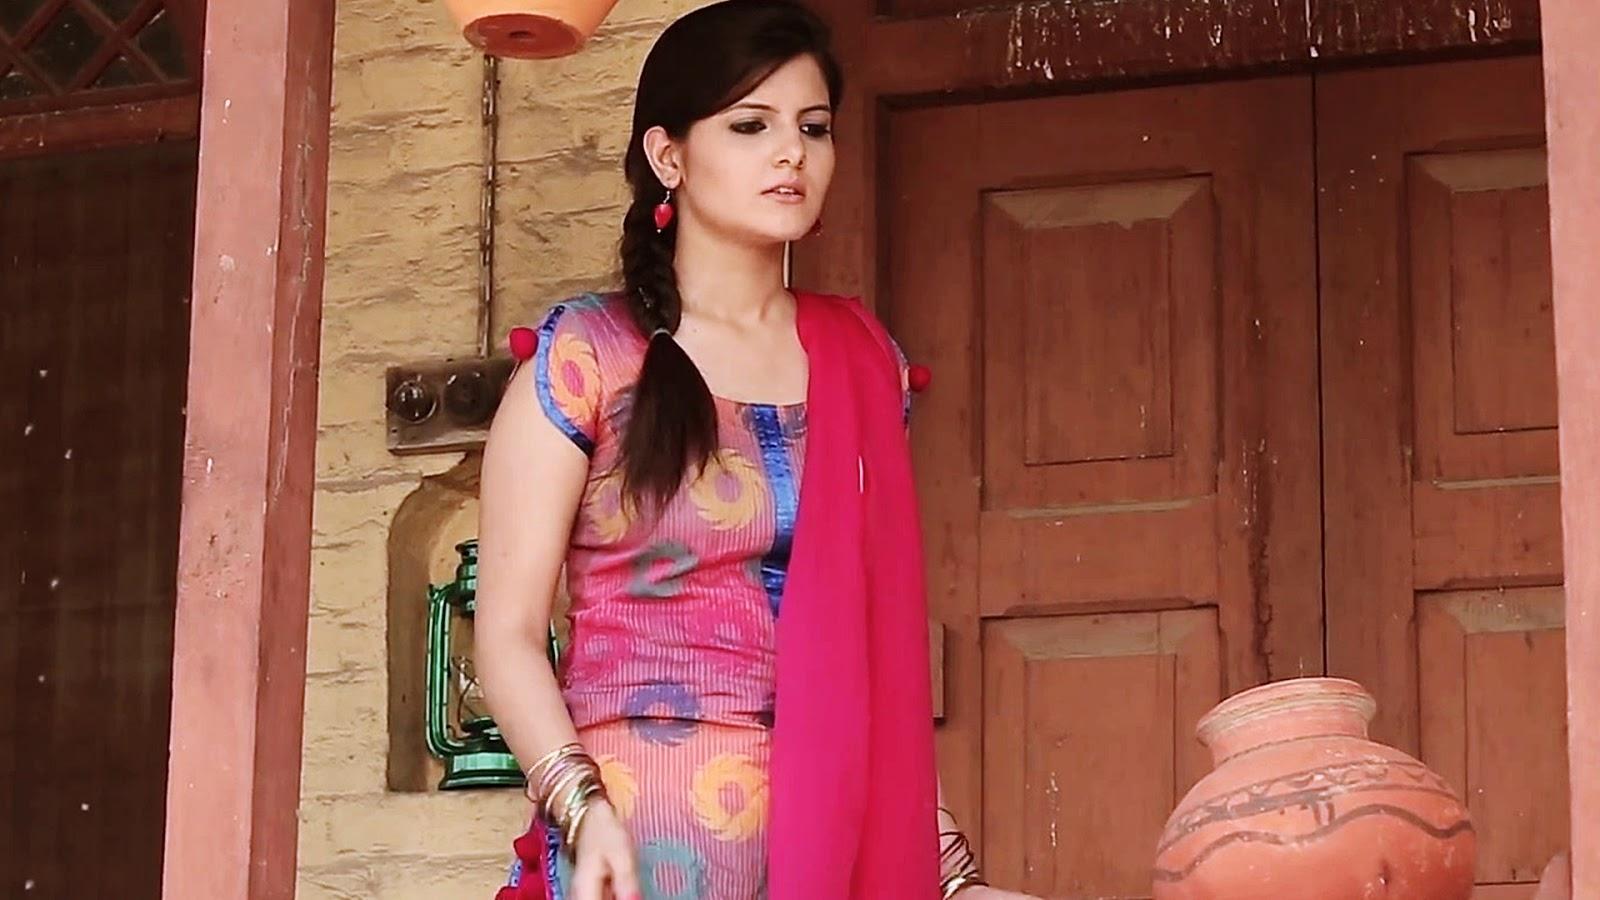 Punjabi Girls Photos Hd Whatsapp Image